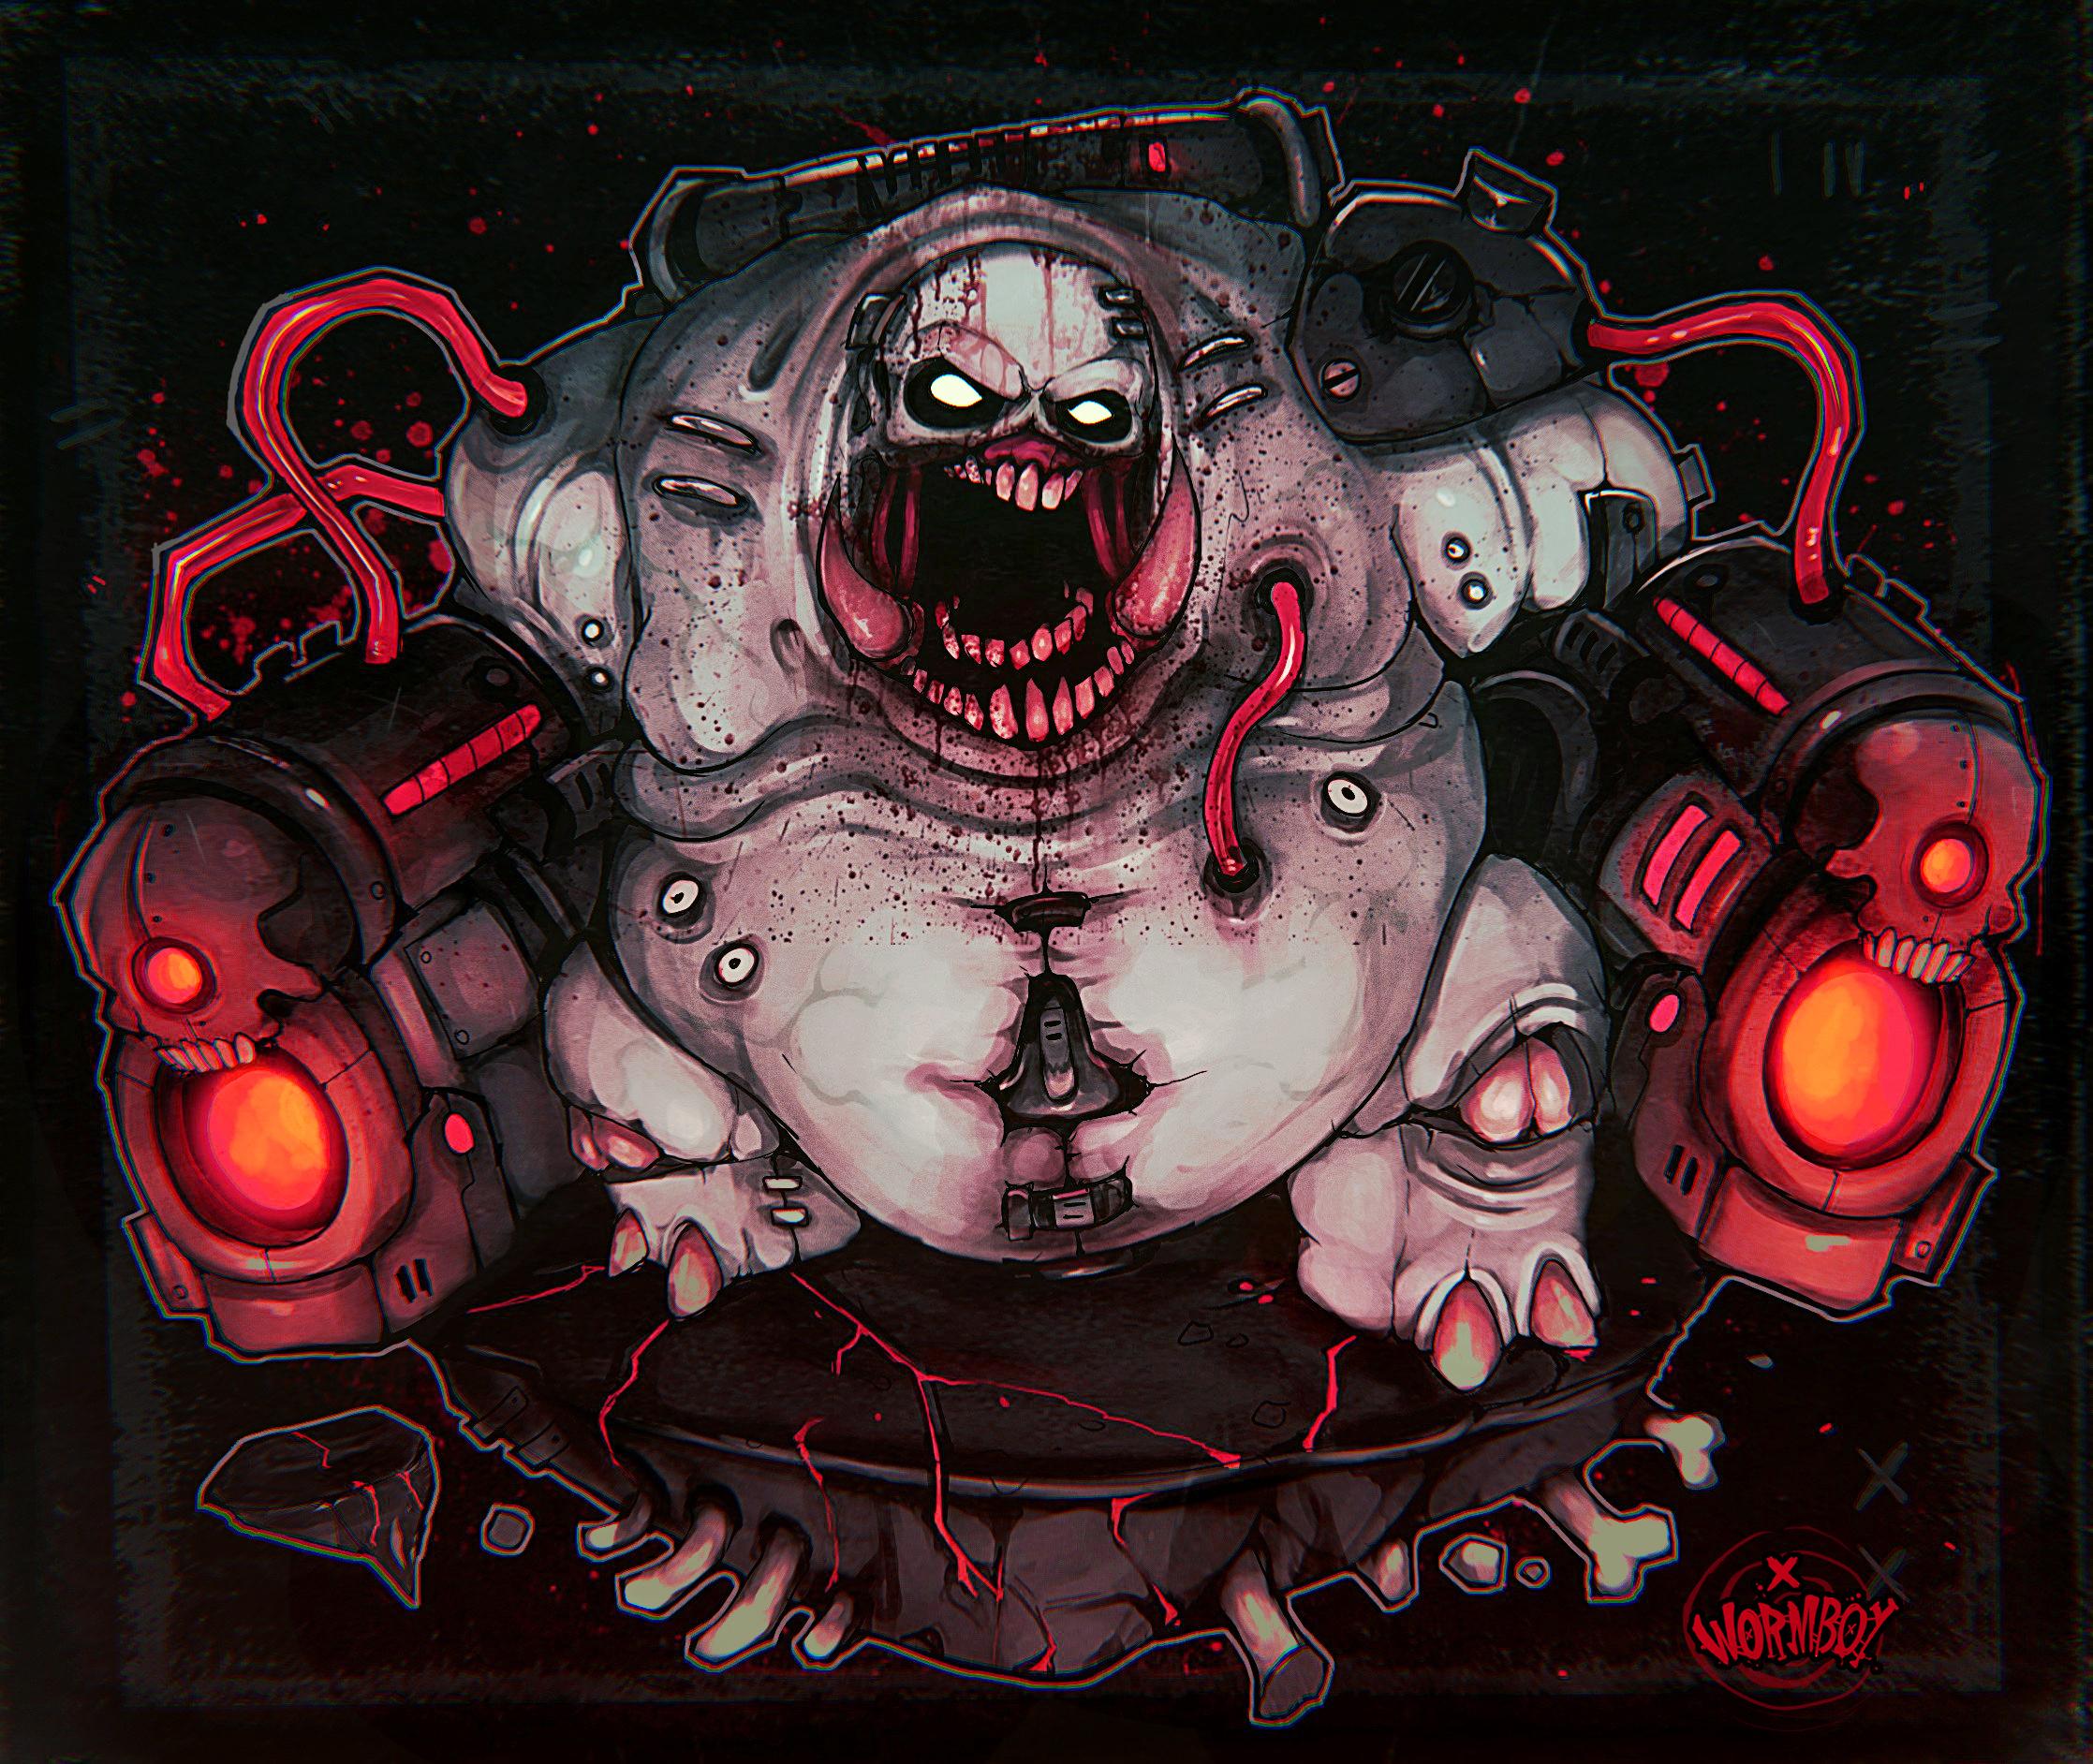 DOOM - THE MANCUBUS